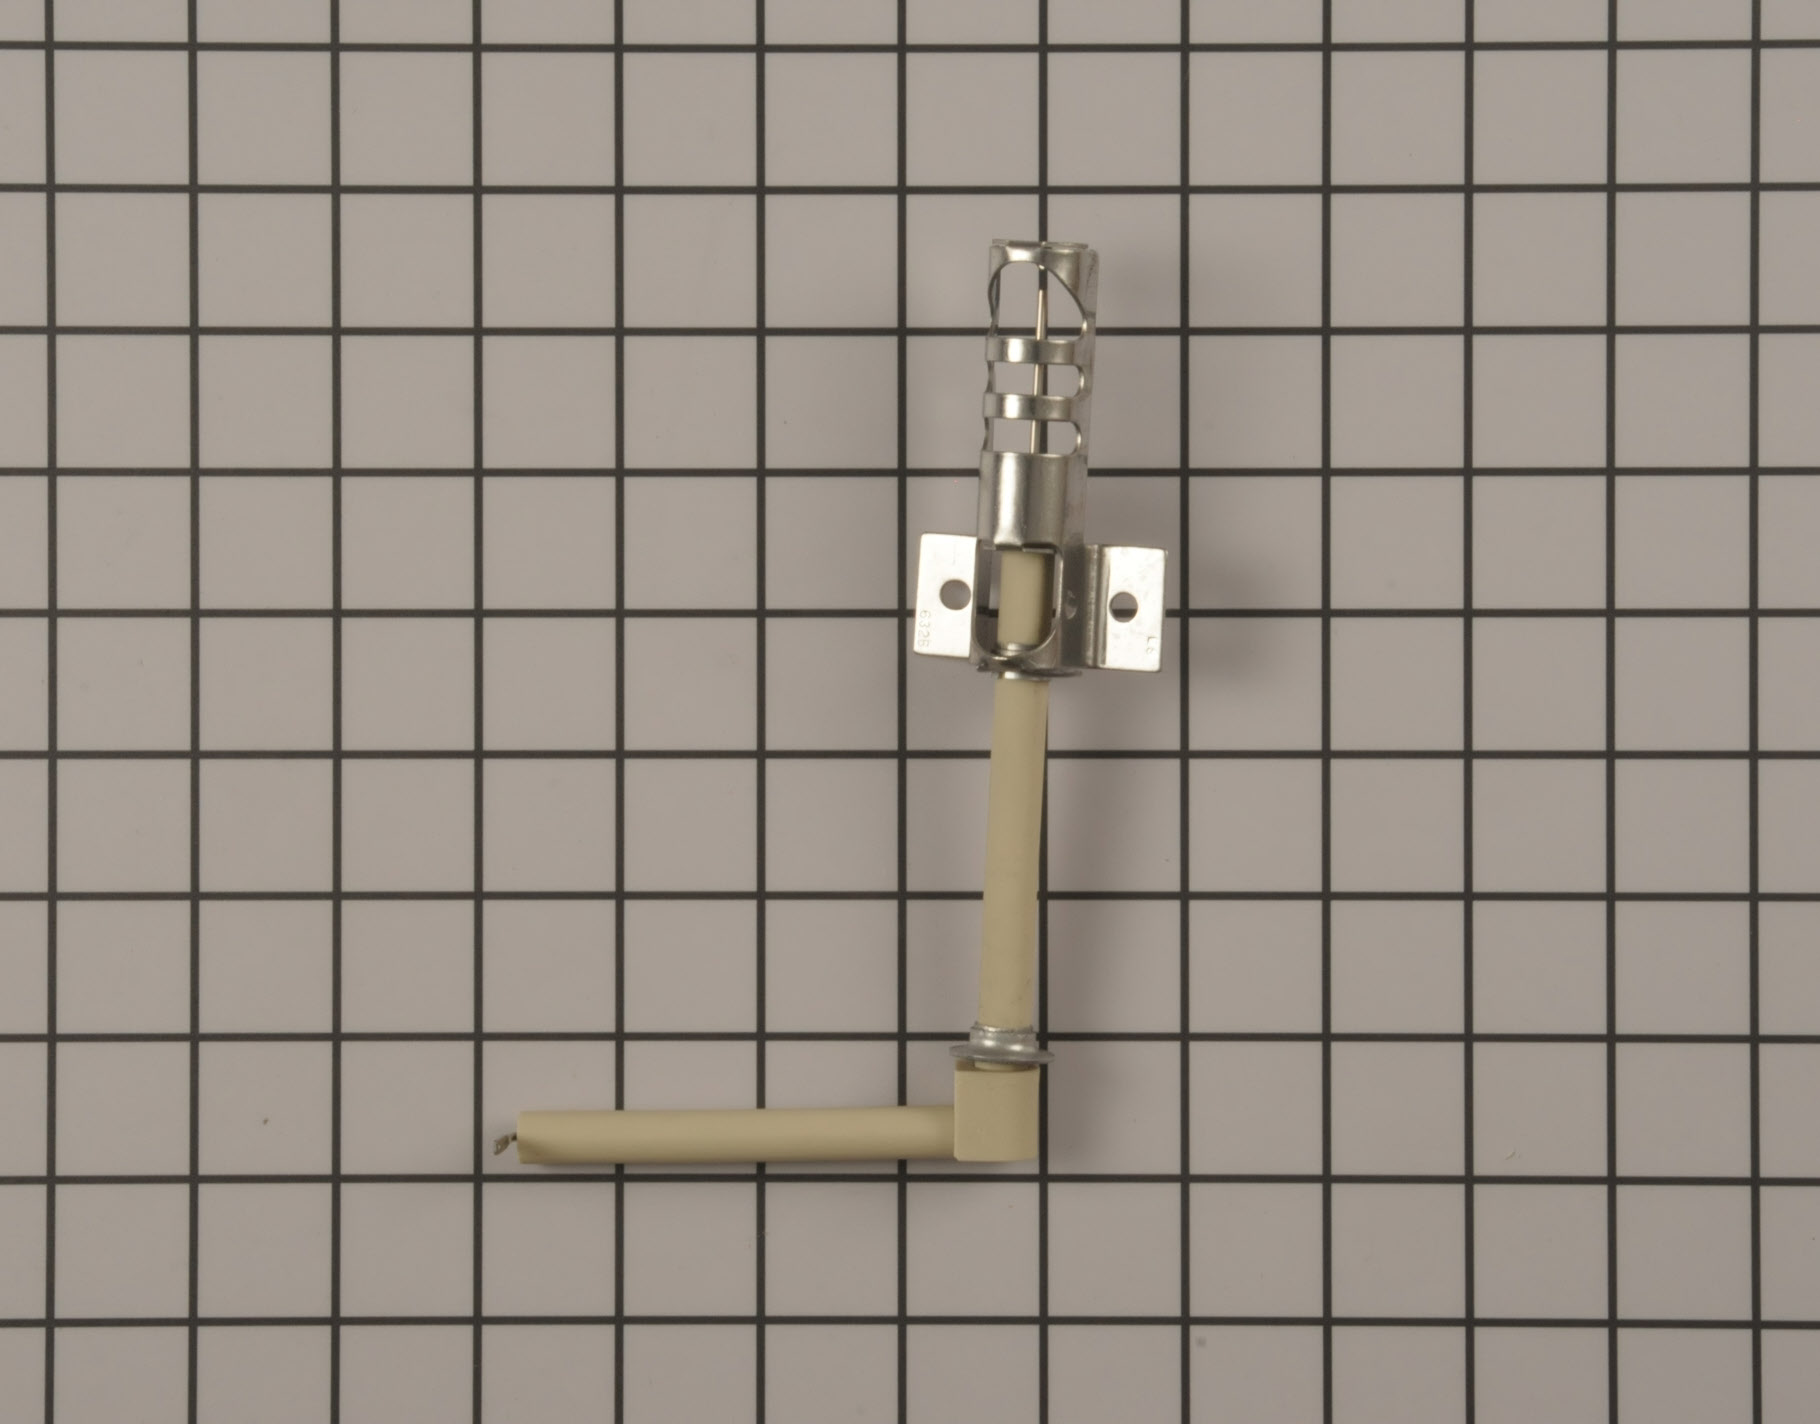 Whirlpool Range/Stove/Oven Part # WP9760229 - Bake or Broil Spark Electrode